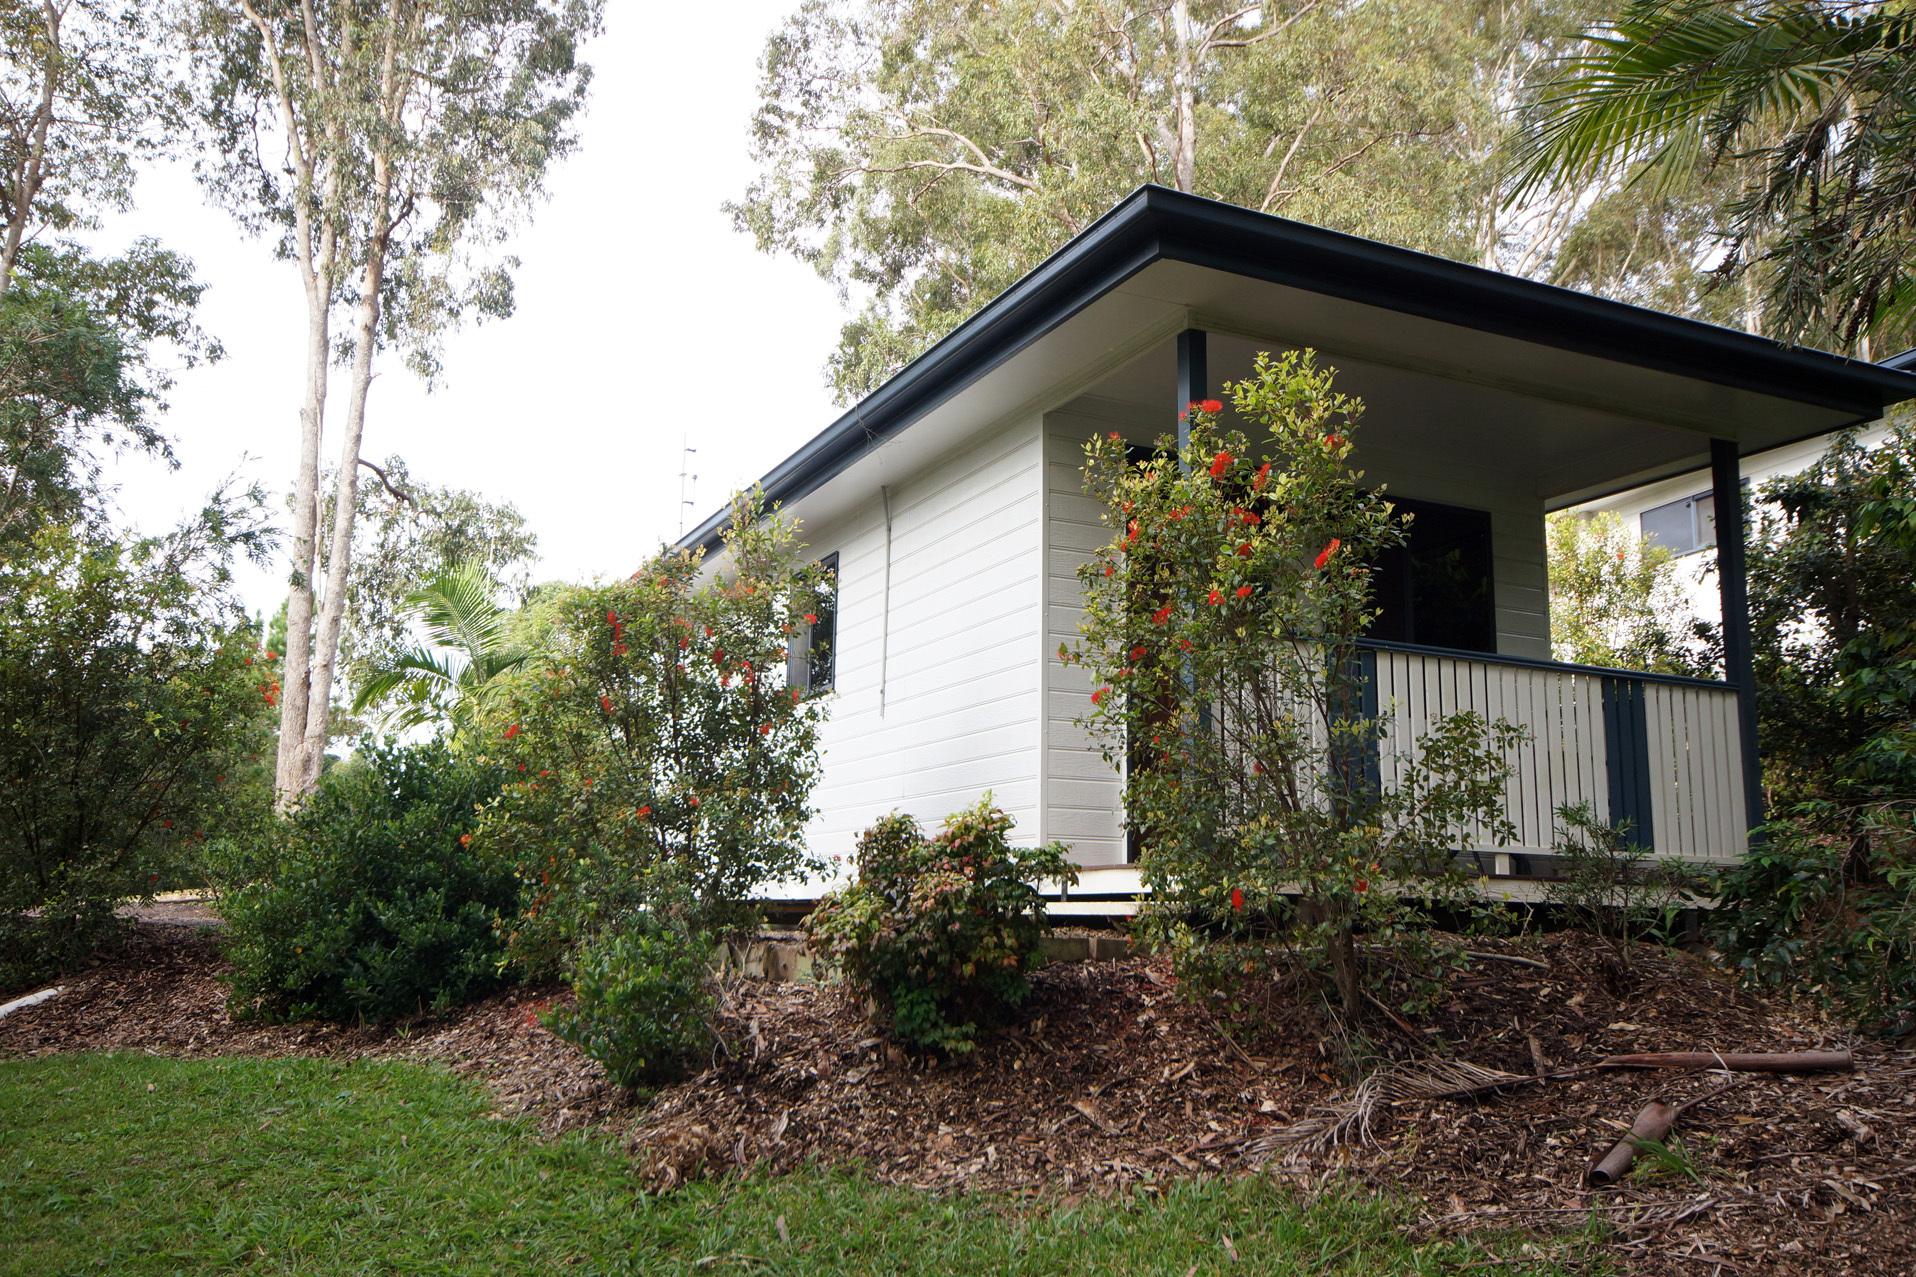 b - Mapleton Cabins & Caravan Park